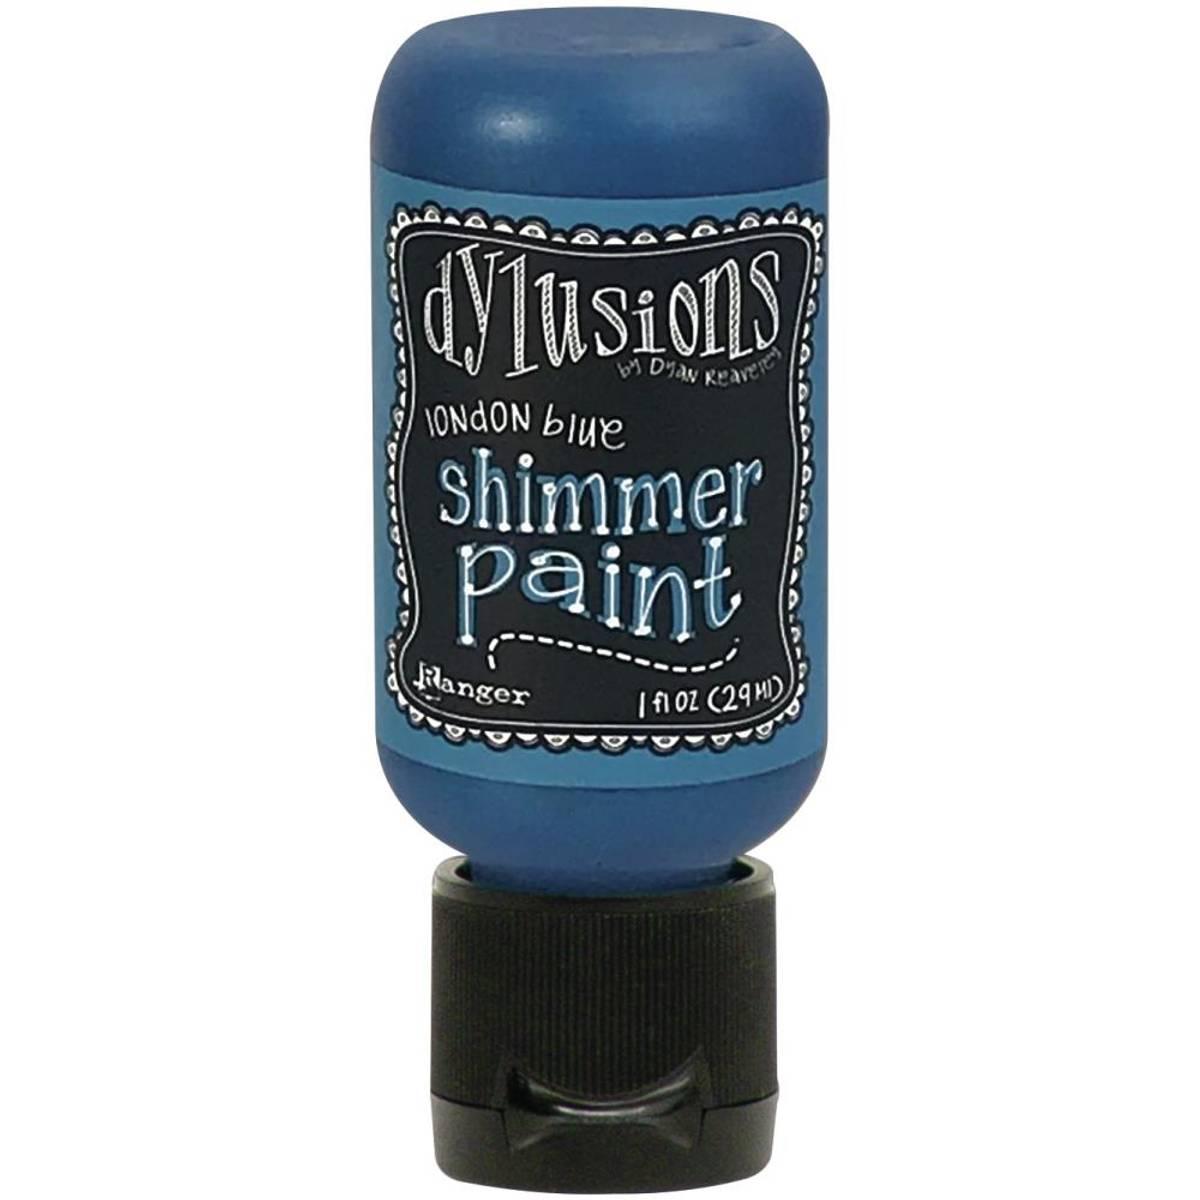 Shimmer Paint 1oz; London Blue